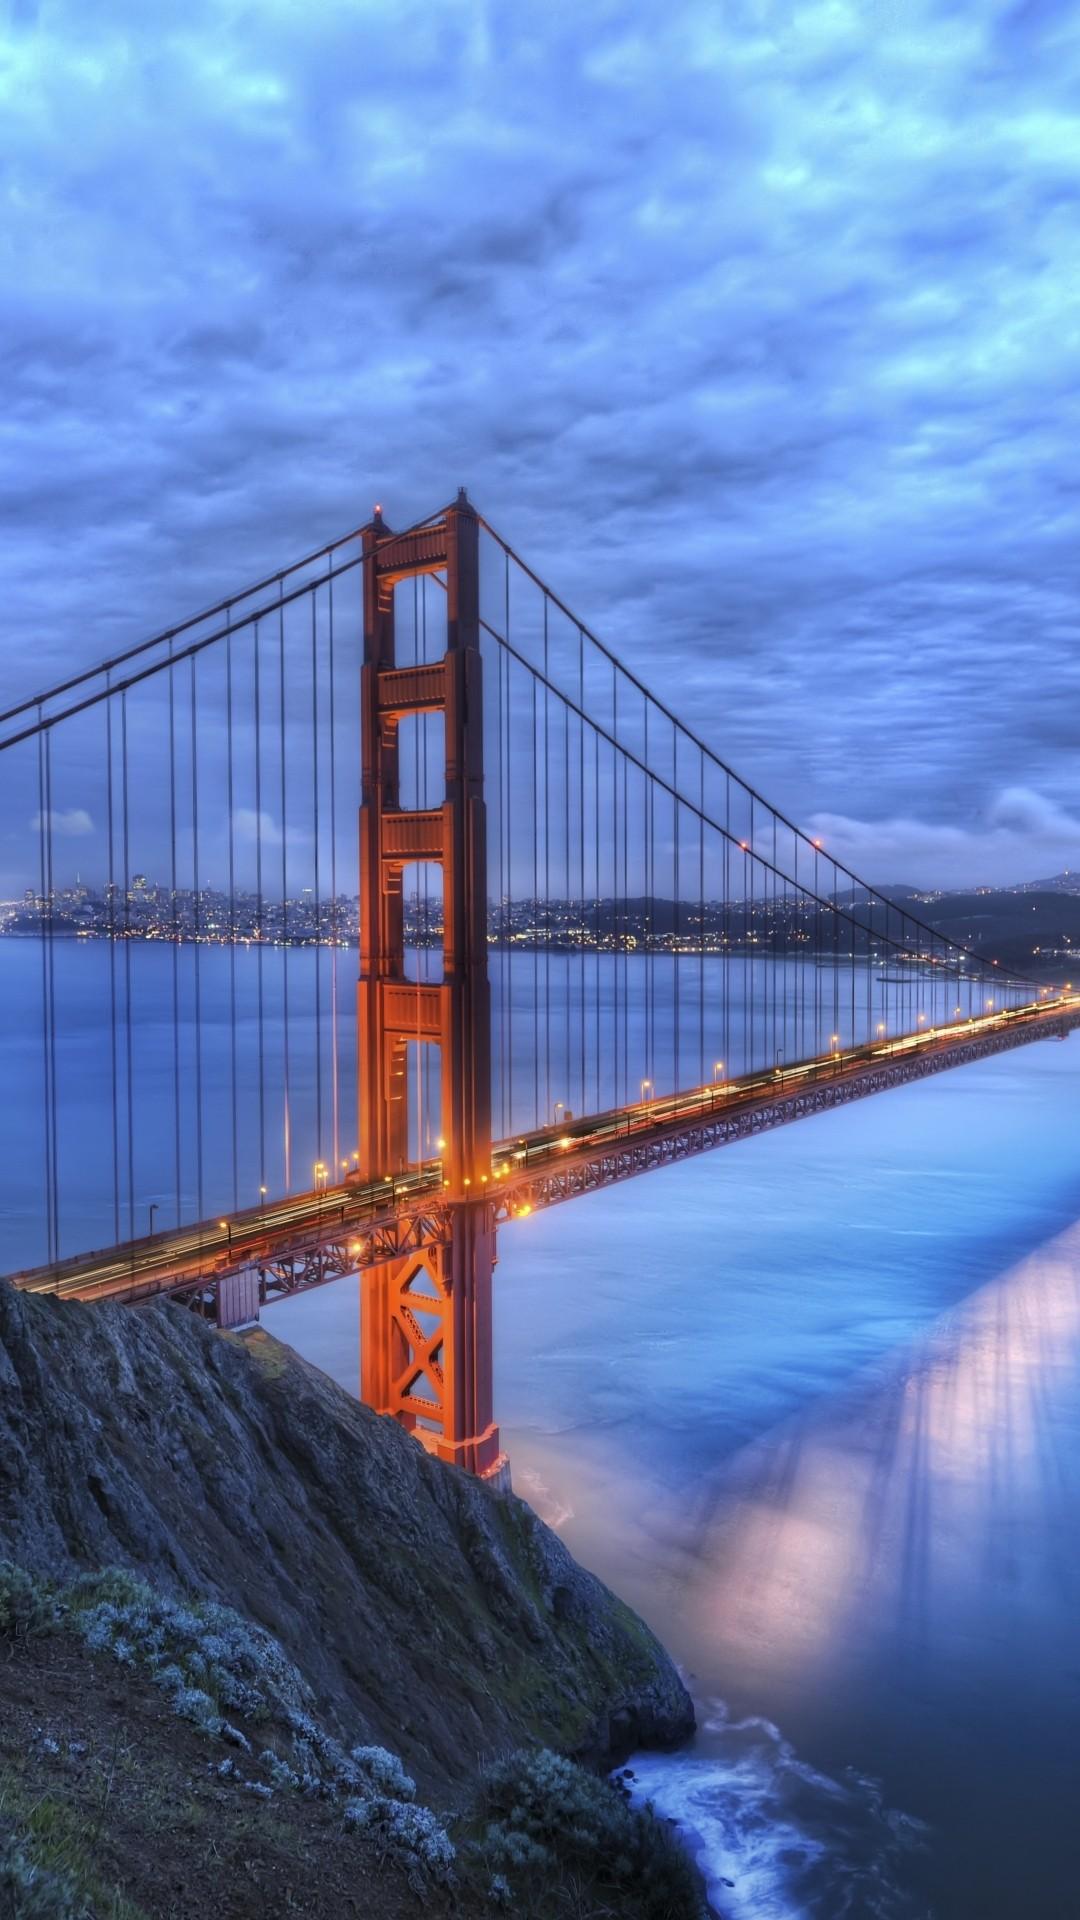 Golden Gate Bridge iphone 6 wallpaper